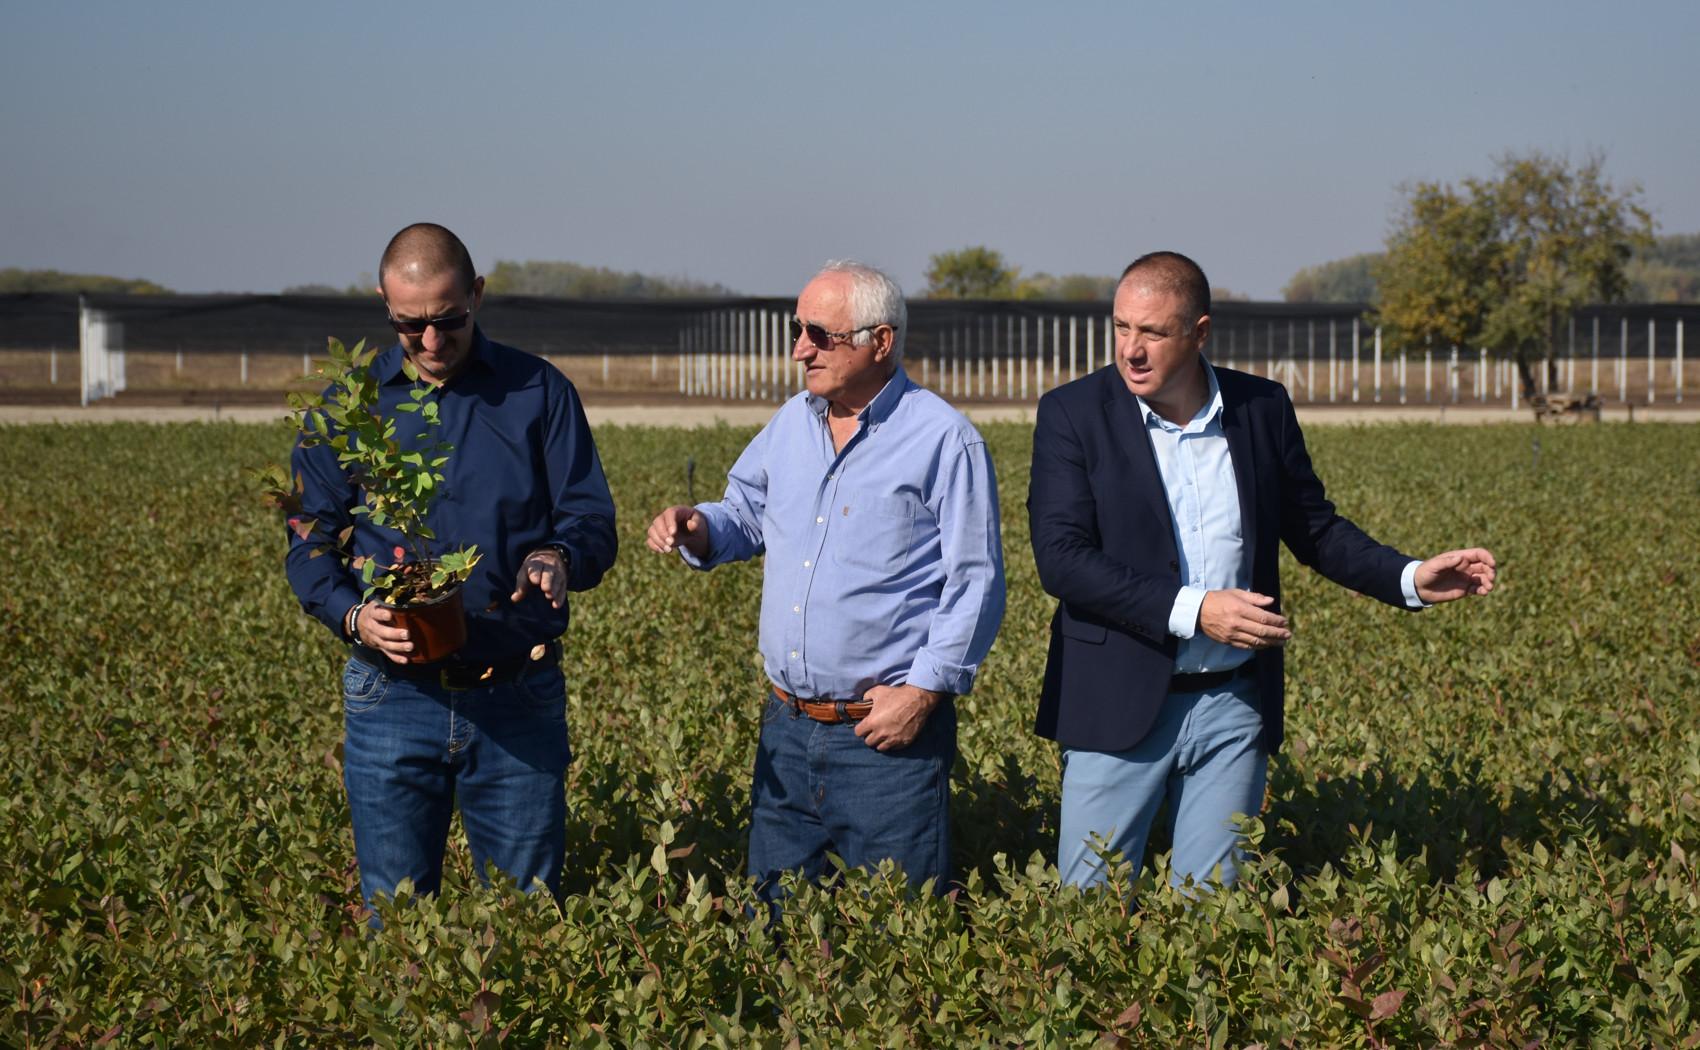 otac i dva sina i sadnice borovnica